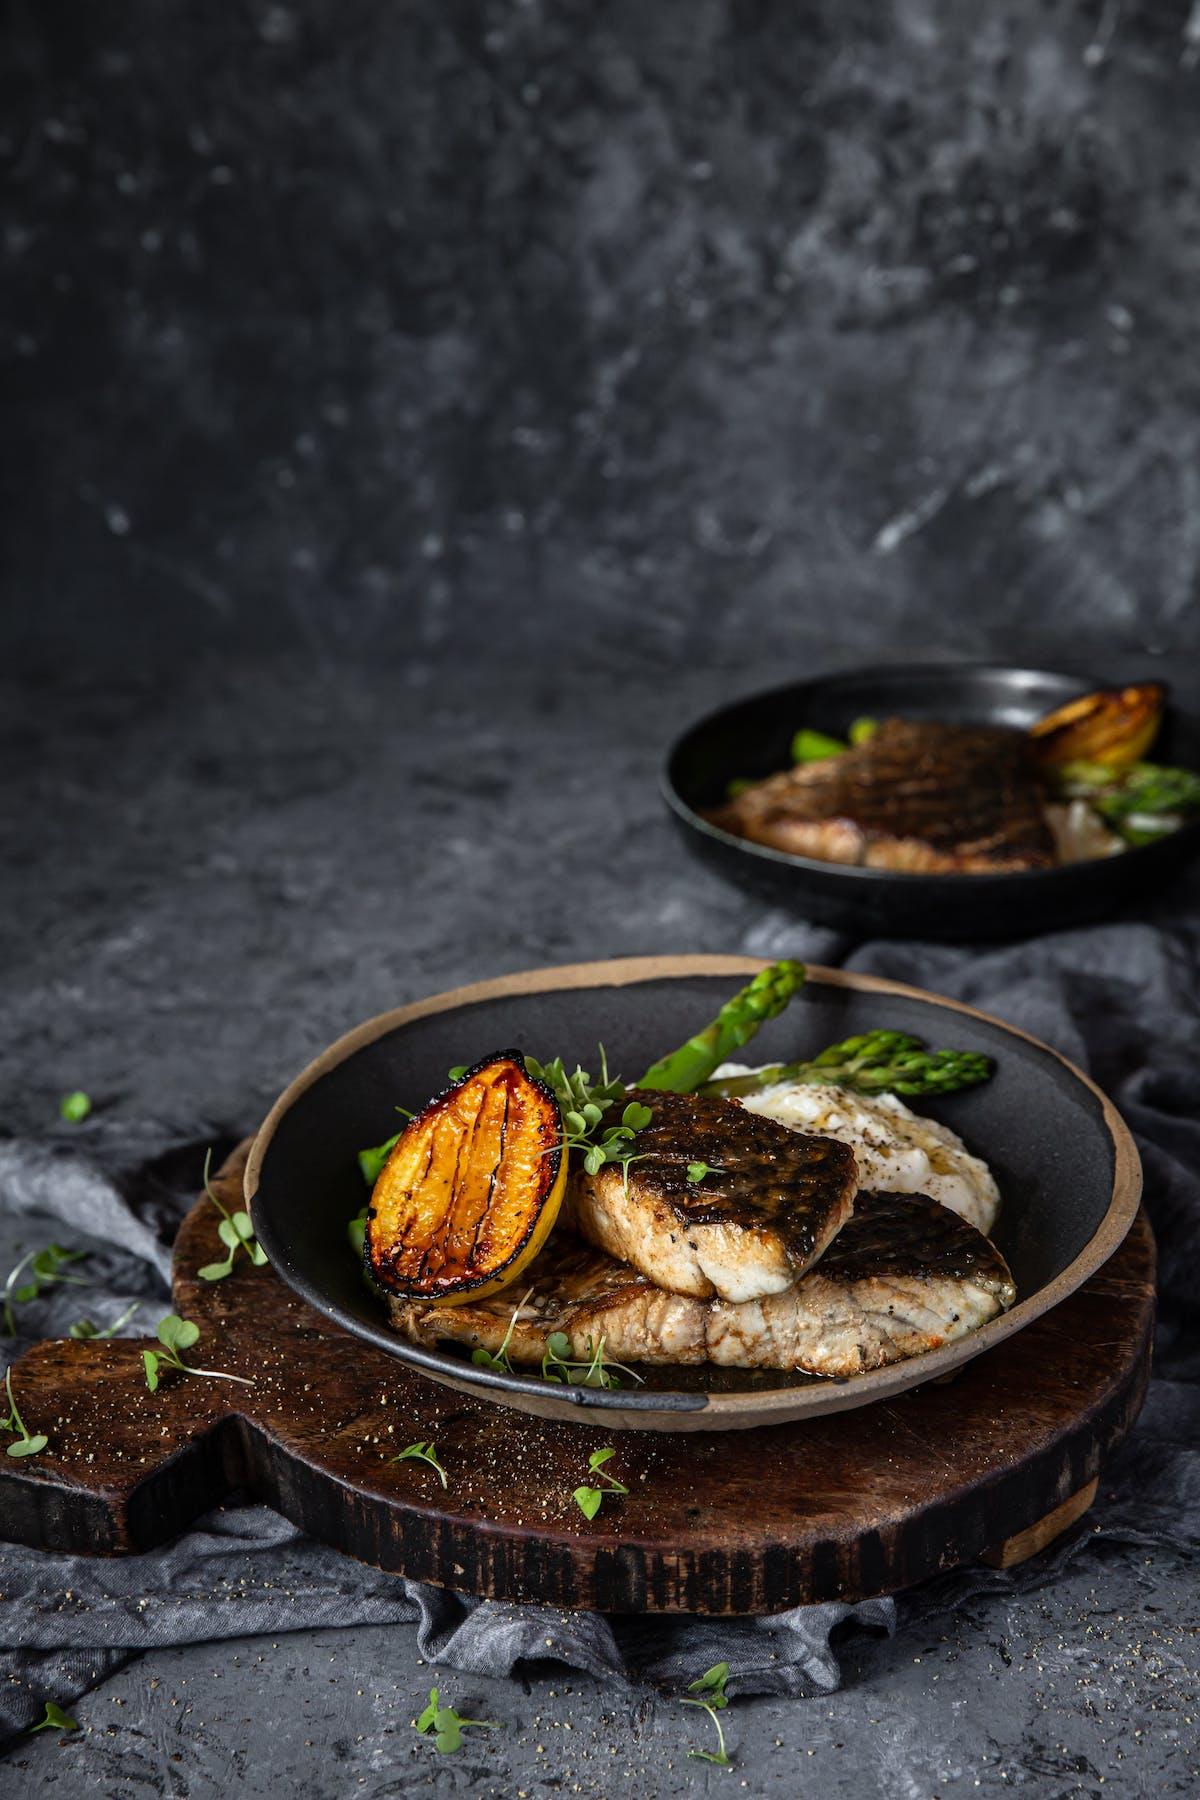 Pan-seared barramundi with lemon and cauliflower mash